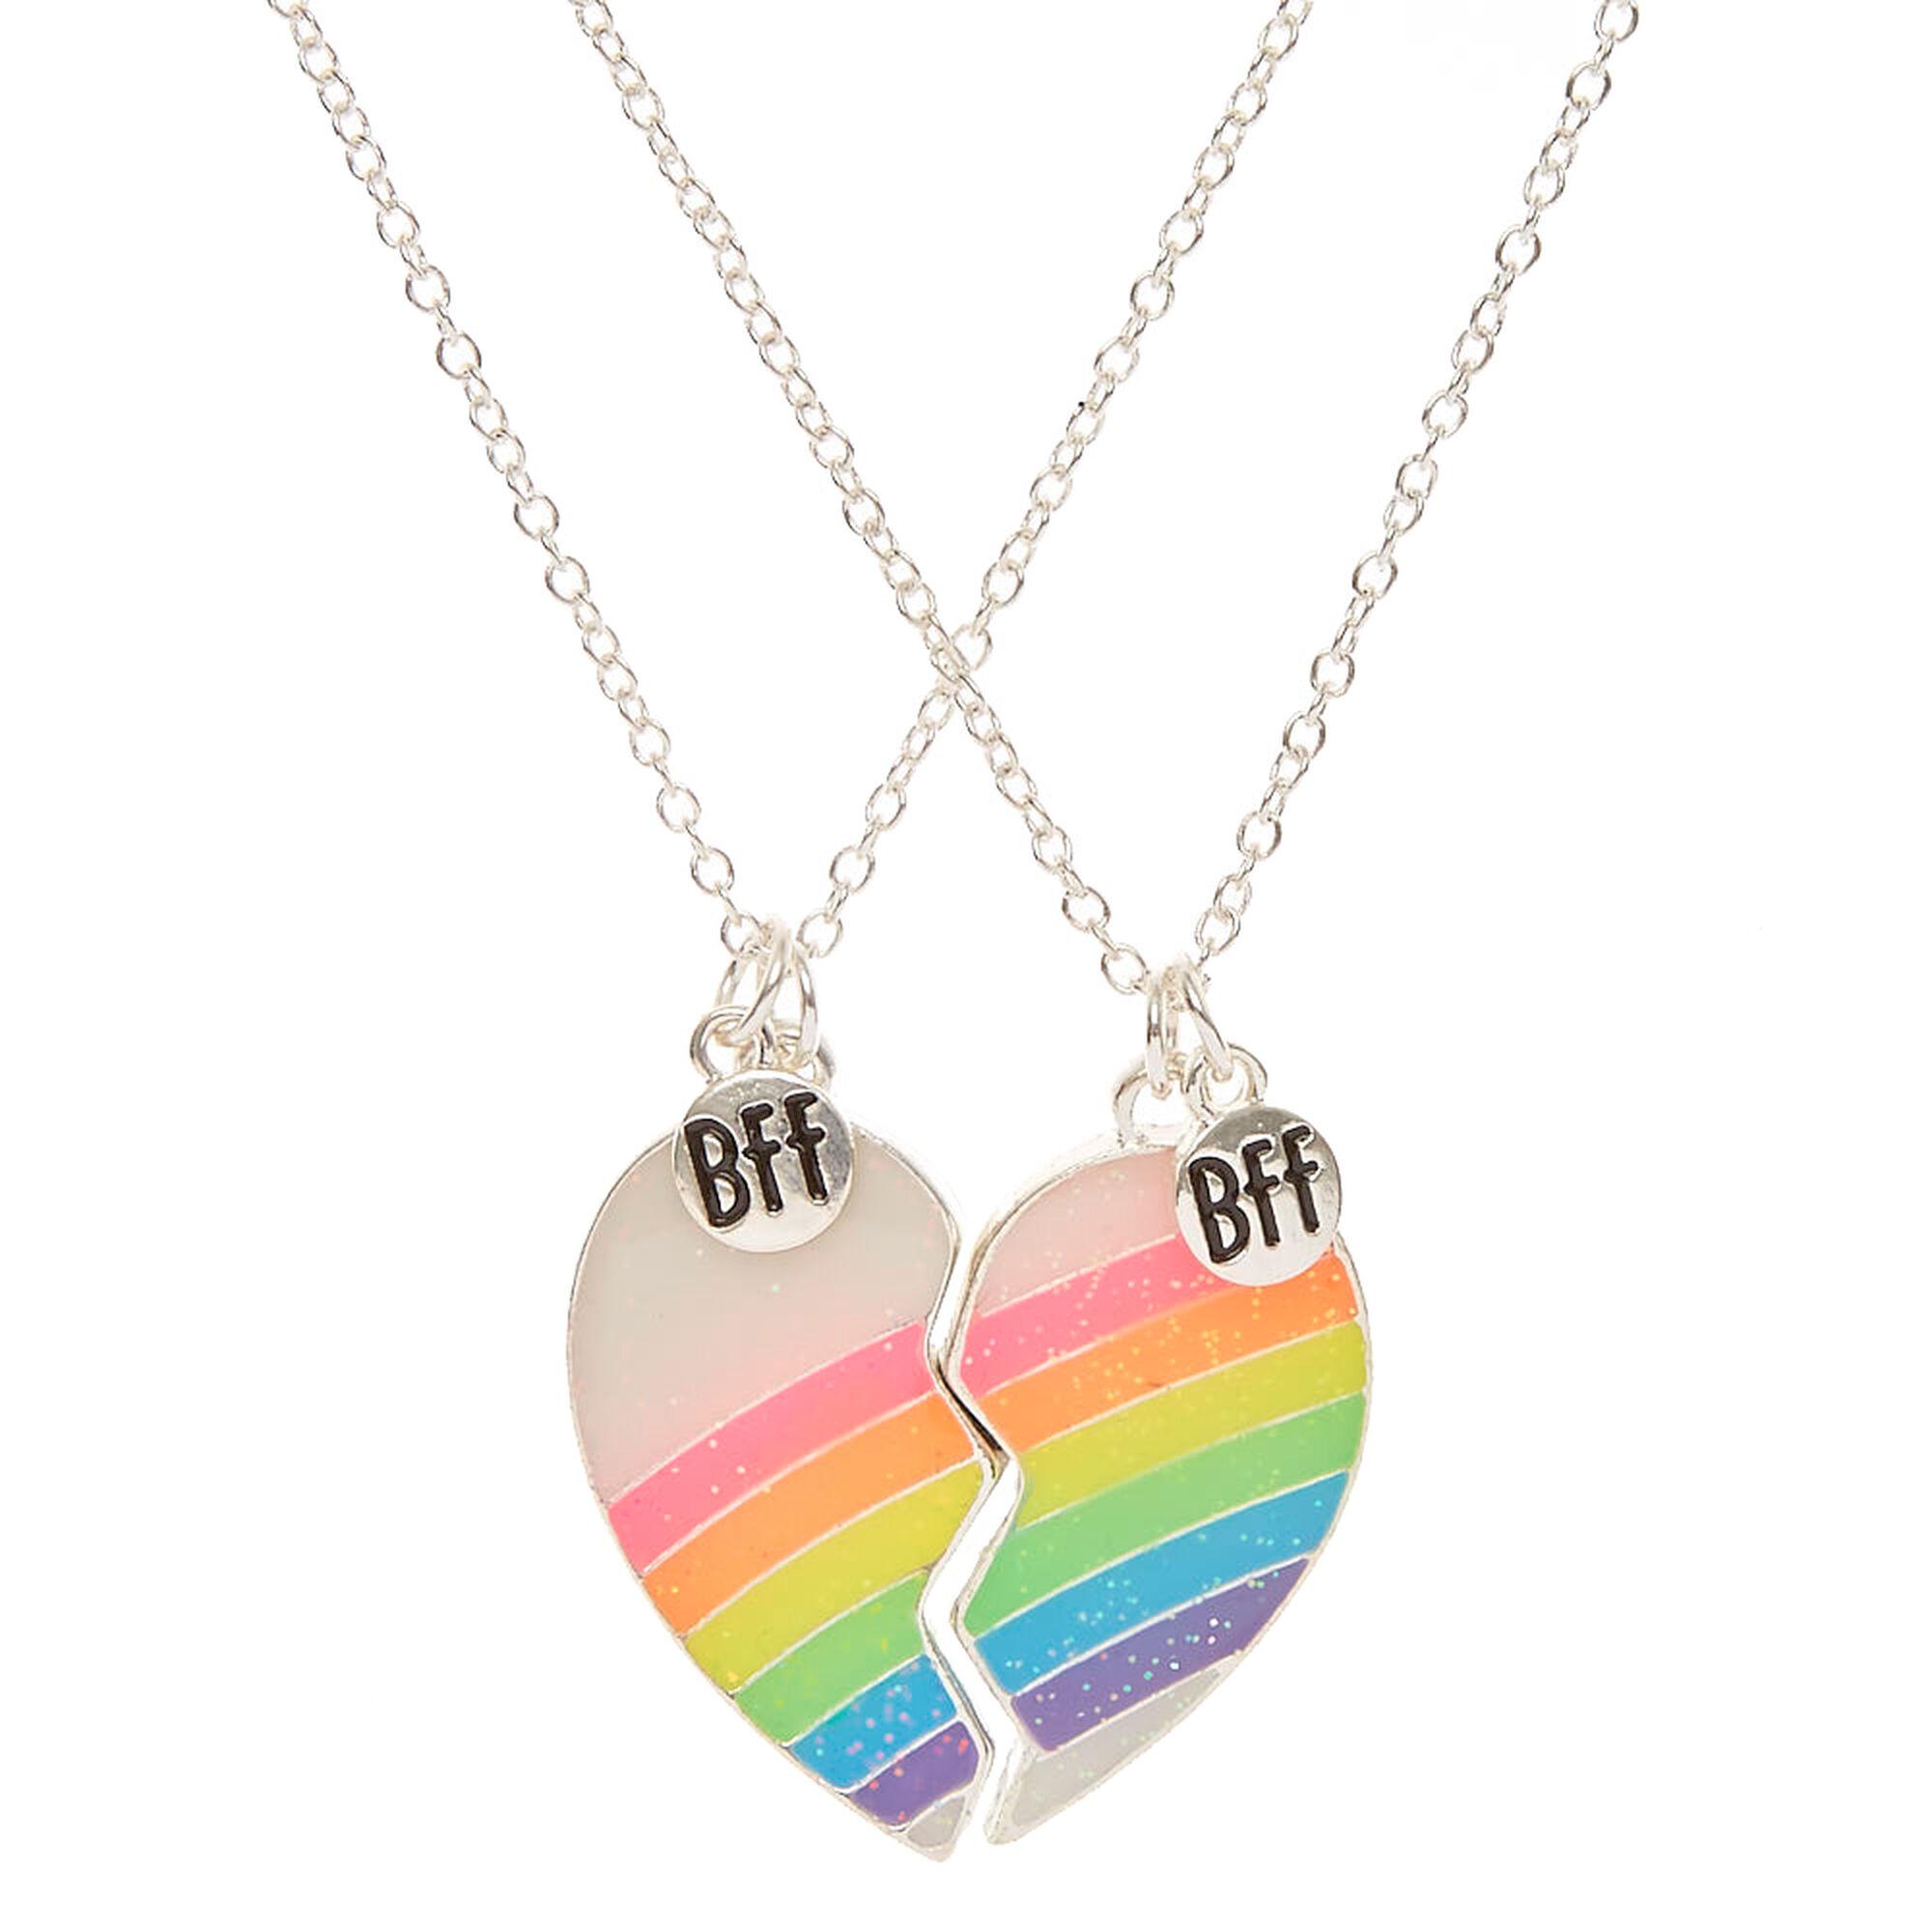 Best Friends Neon Rainbow Split Heart Pendant Necklaces